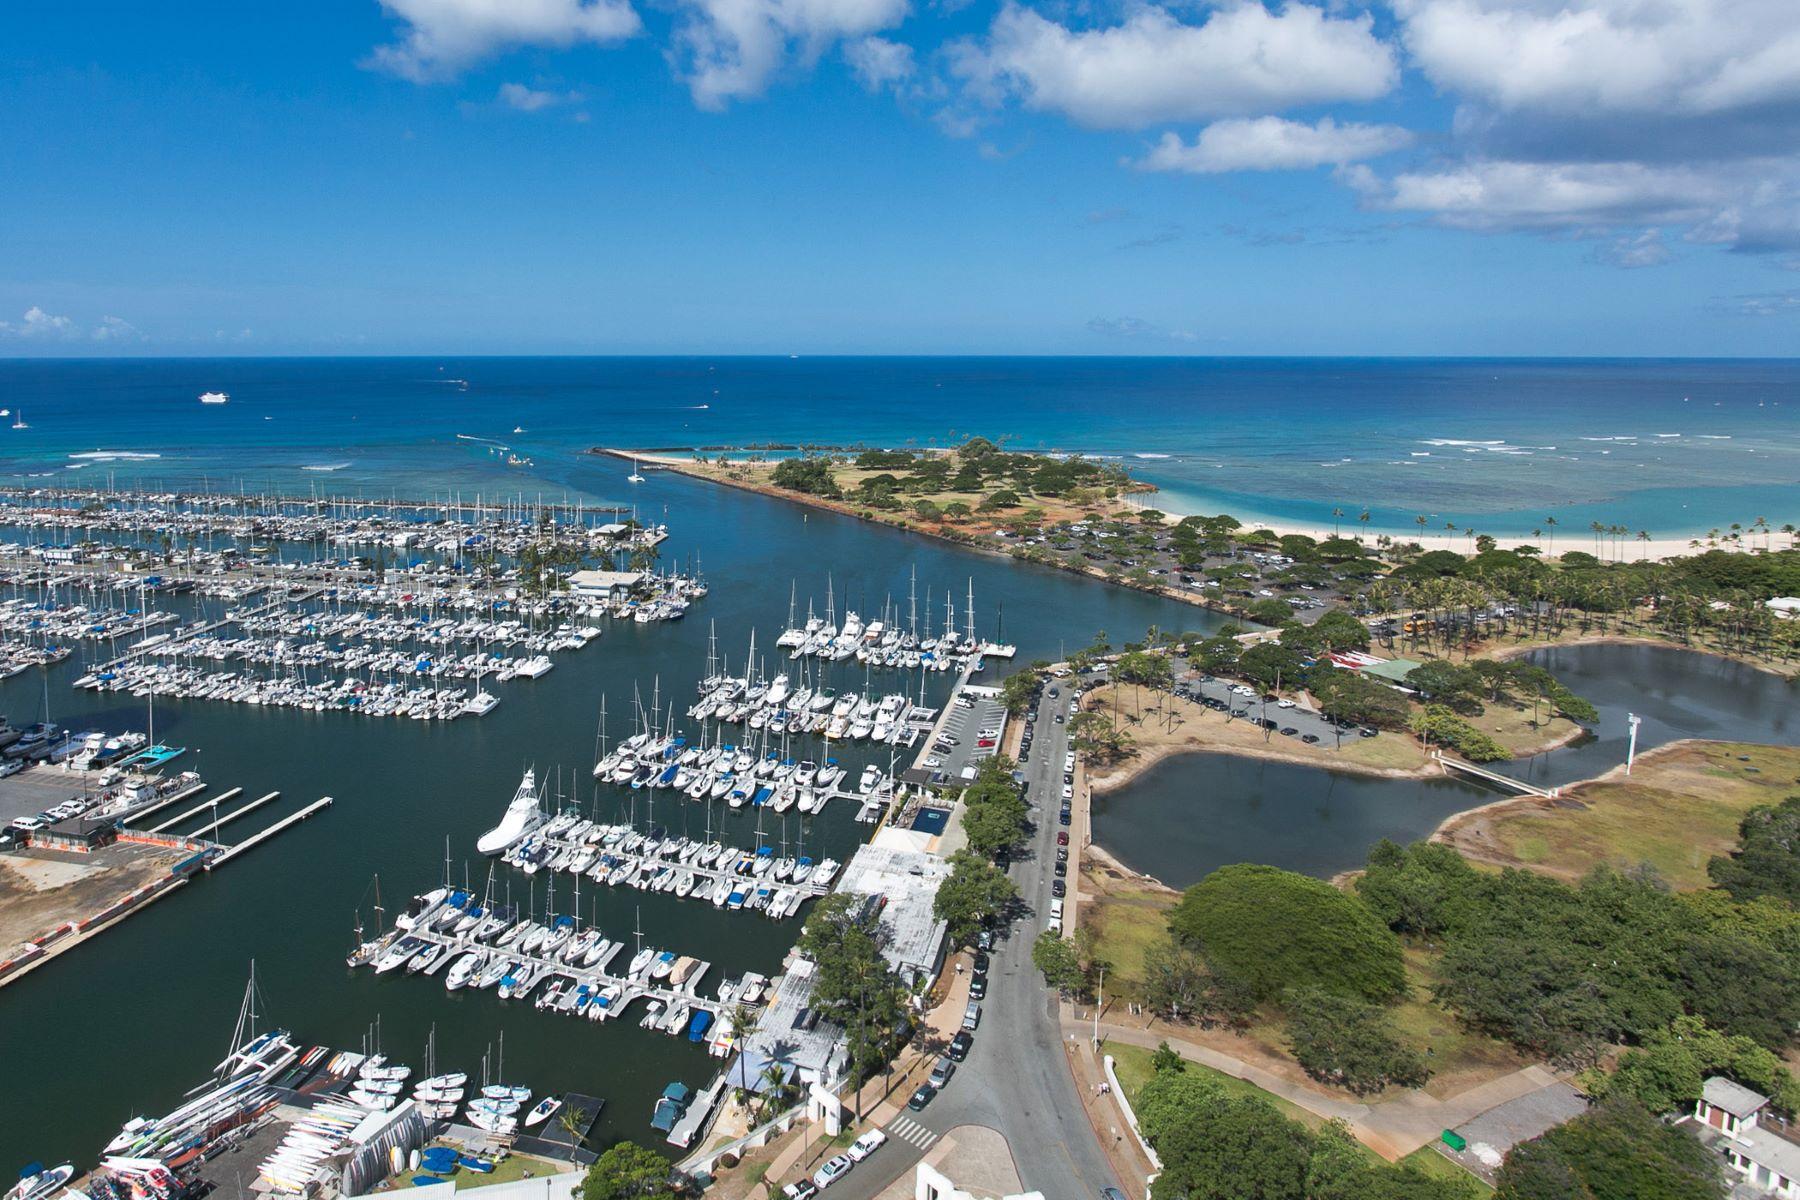 Appartement en copropriété pour l Vente à Hawaiian Sunset Views 1600 Ala Moana Boulevard #3500 Ala Moana, Honolulu, Hawaii, 96815 États-Unis